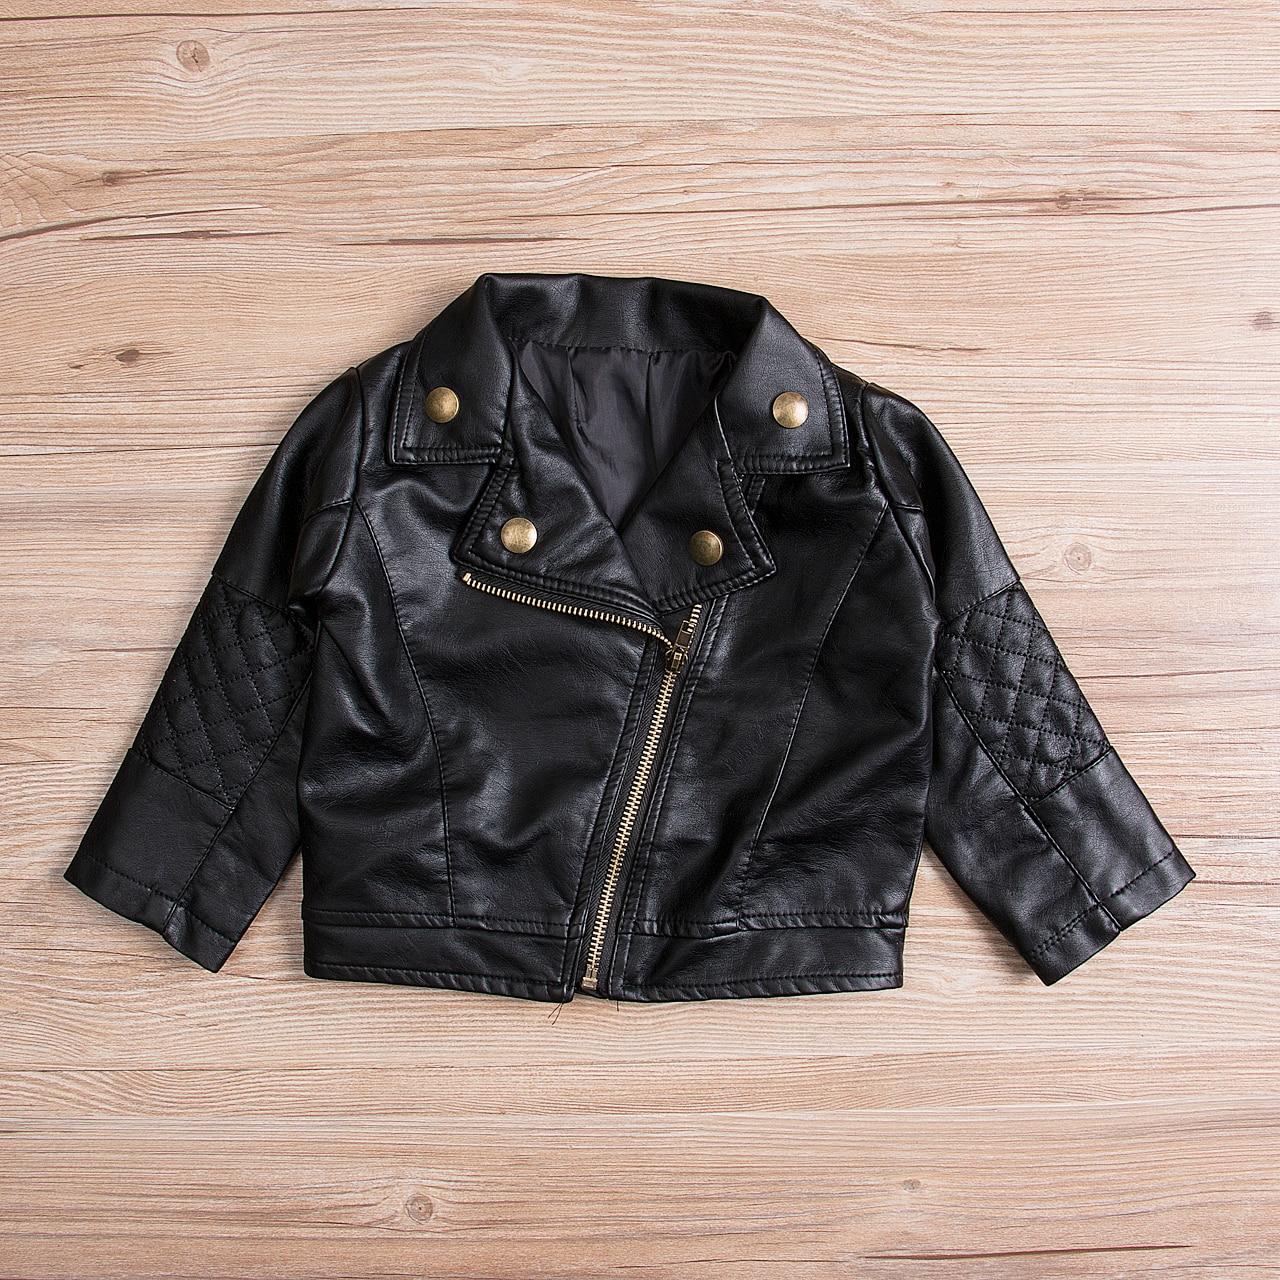 Hot Toddler Kids Girl Fashion Motorcycle Pu Leather Jacket Biker Cool Adorable Coat Black Overcoat Jackets & Coats Mother & Kids